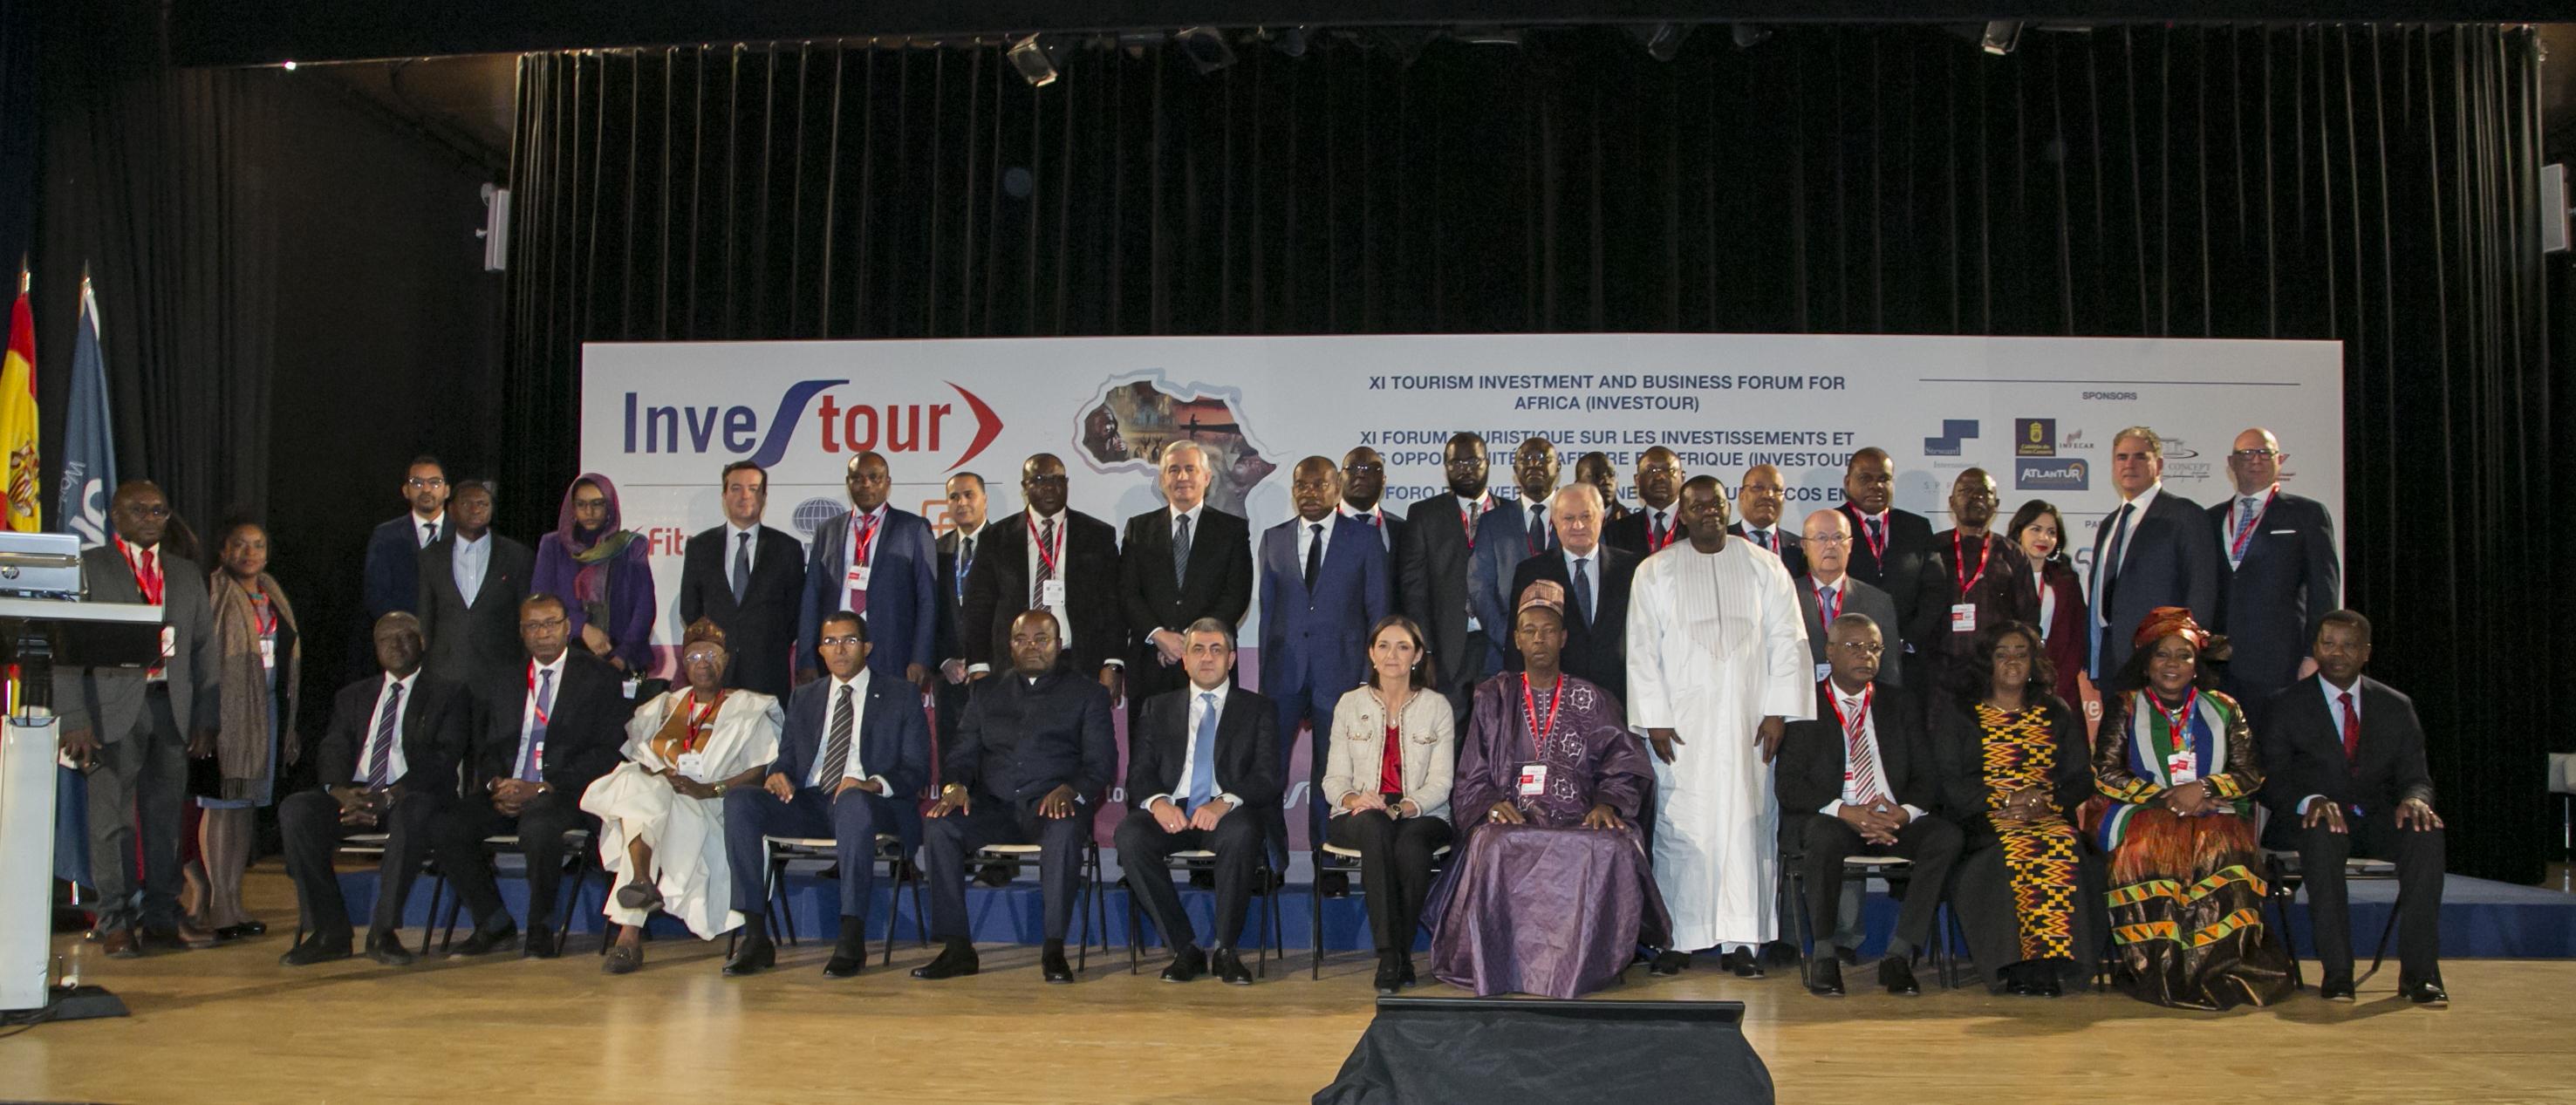 UNWTO Forum Event at FITUR 2020